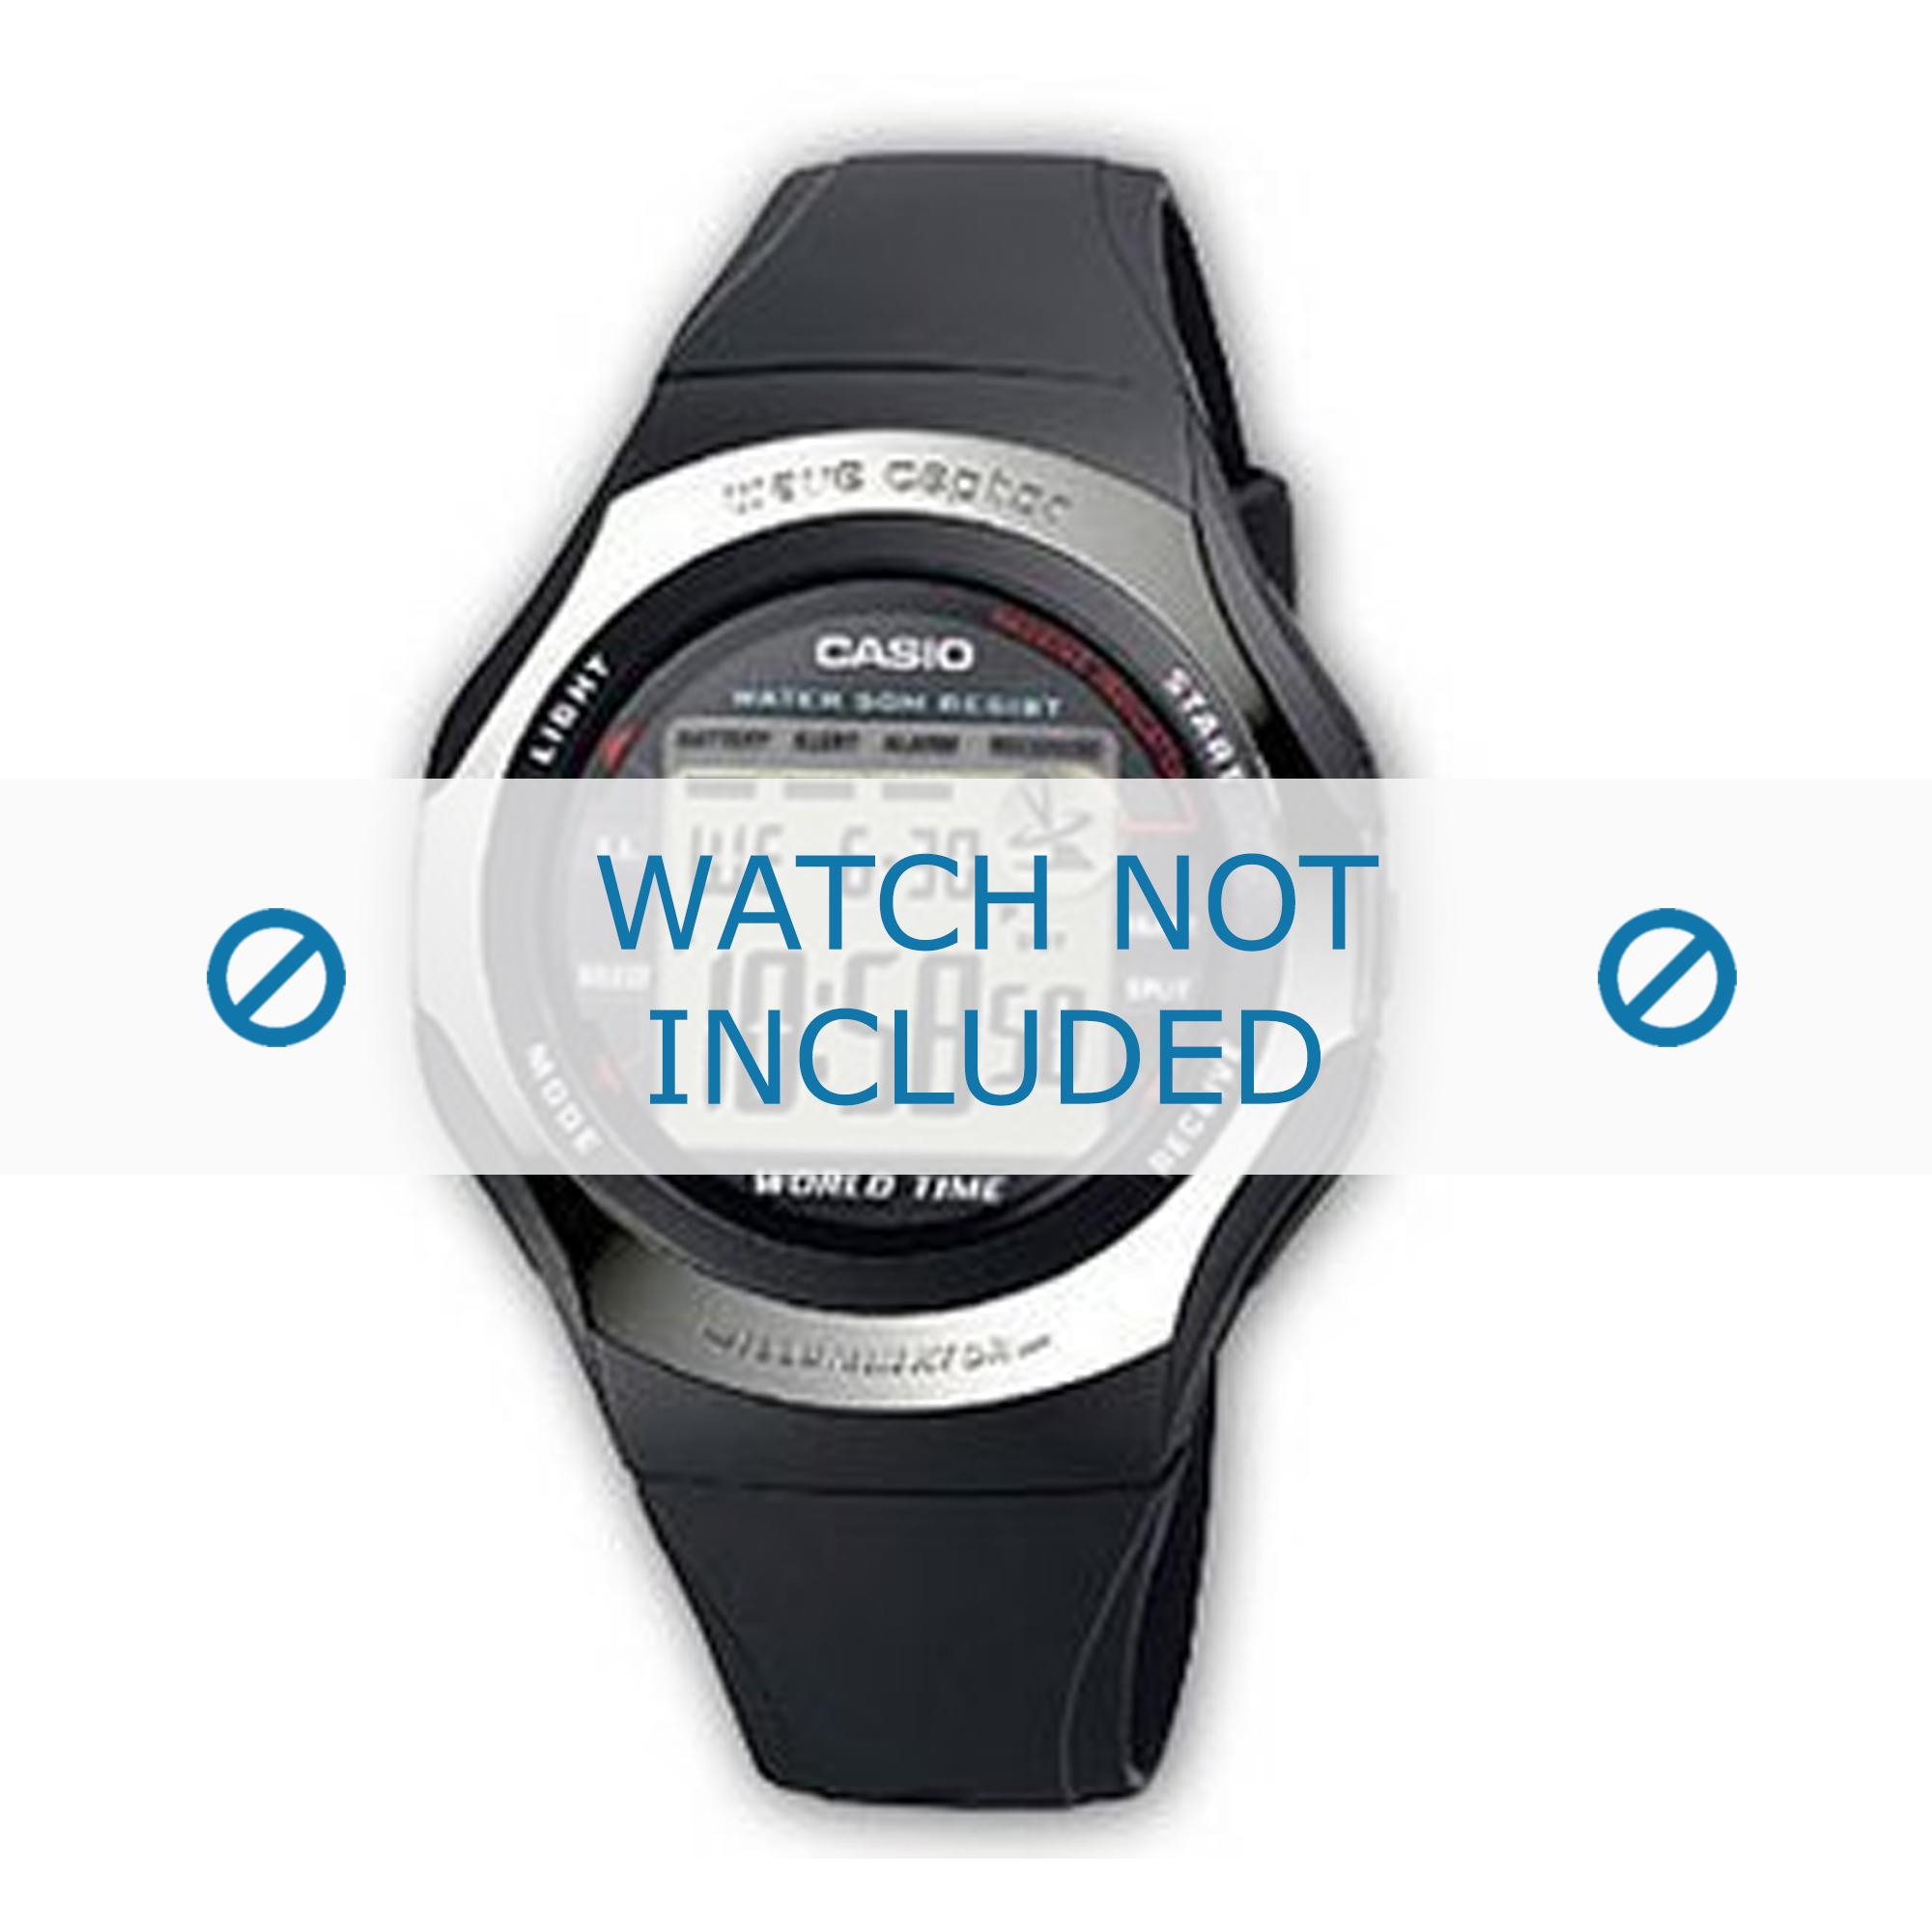 Casio horlogeband WV-56H-1AVER Rubber Zwart